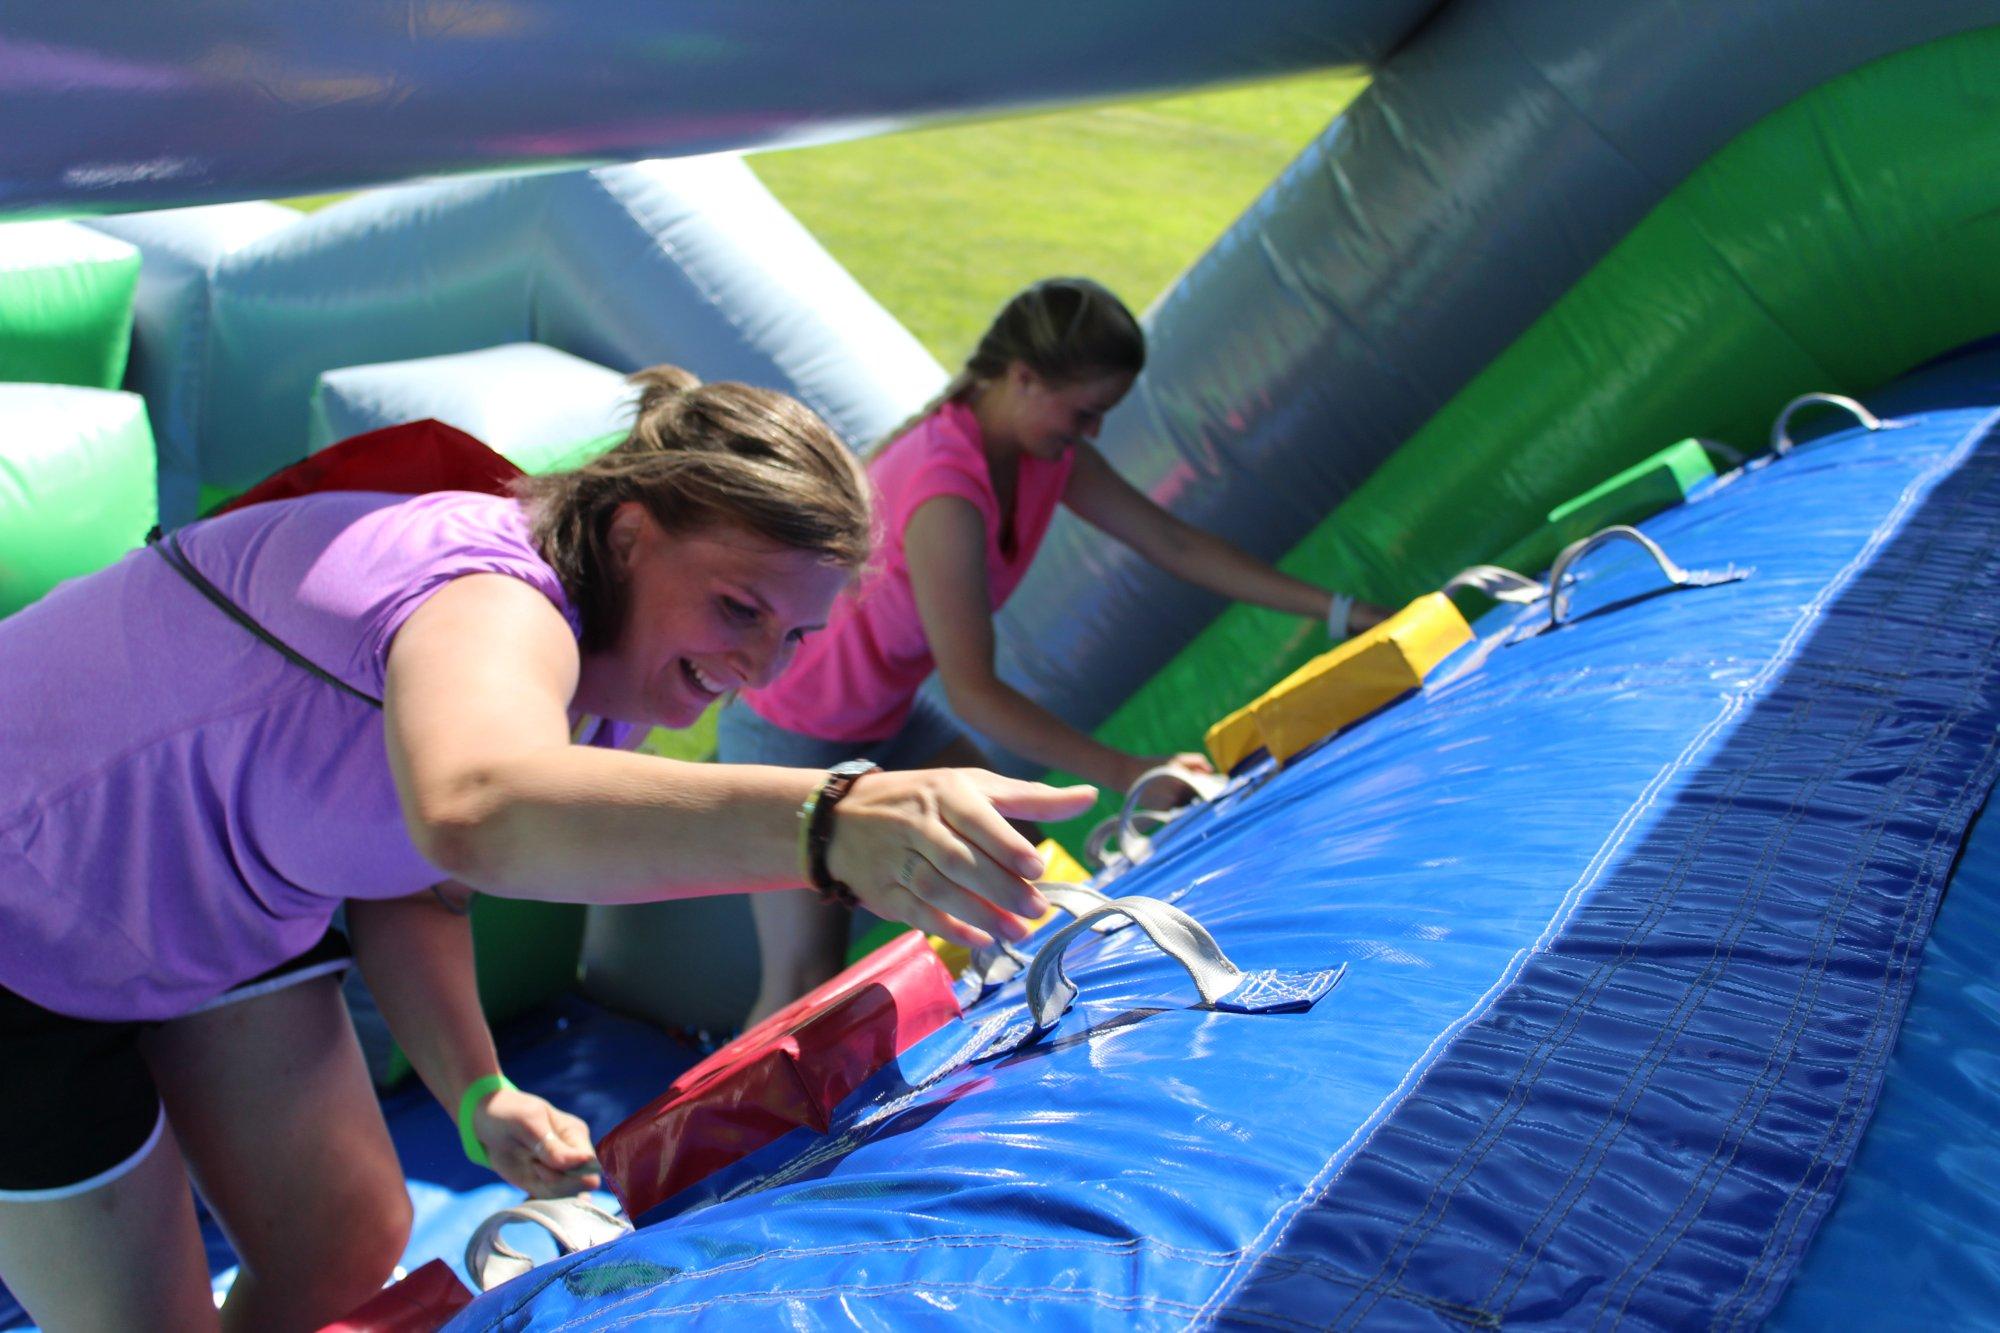 Inflatable slide rentals in Murfreesboro